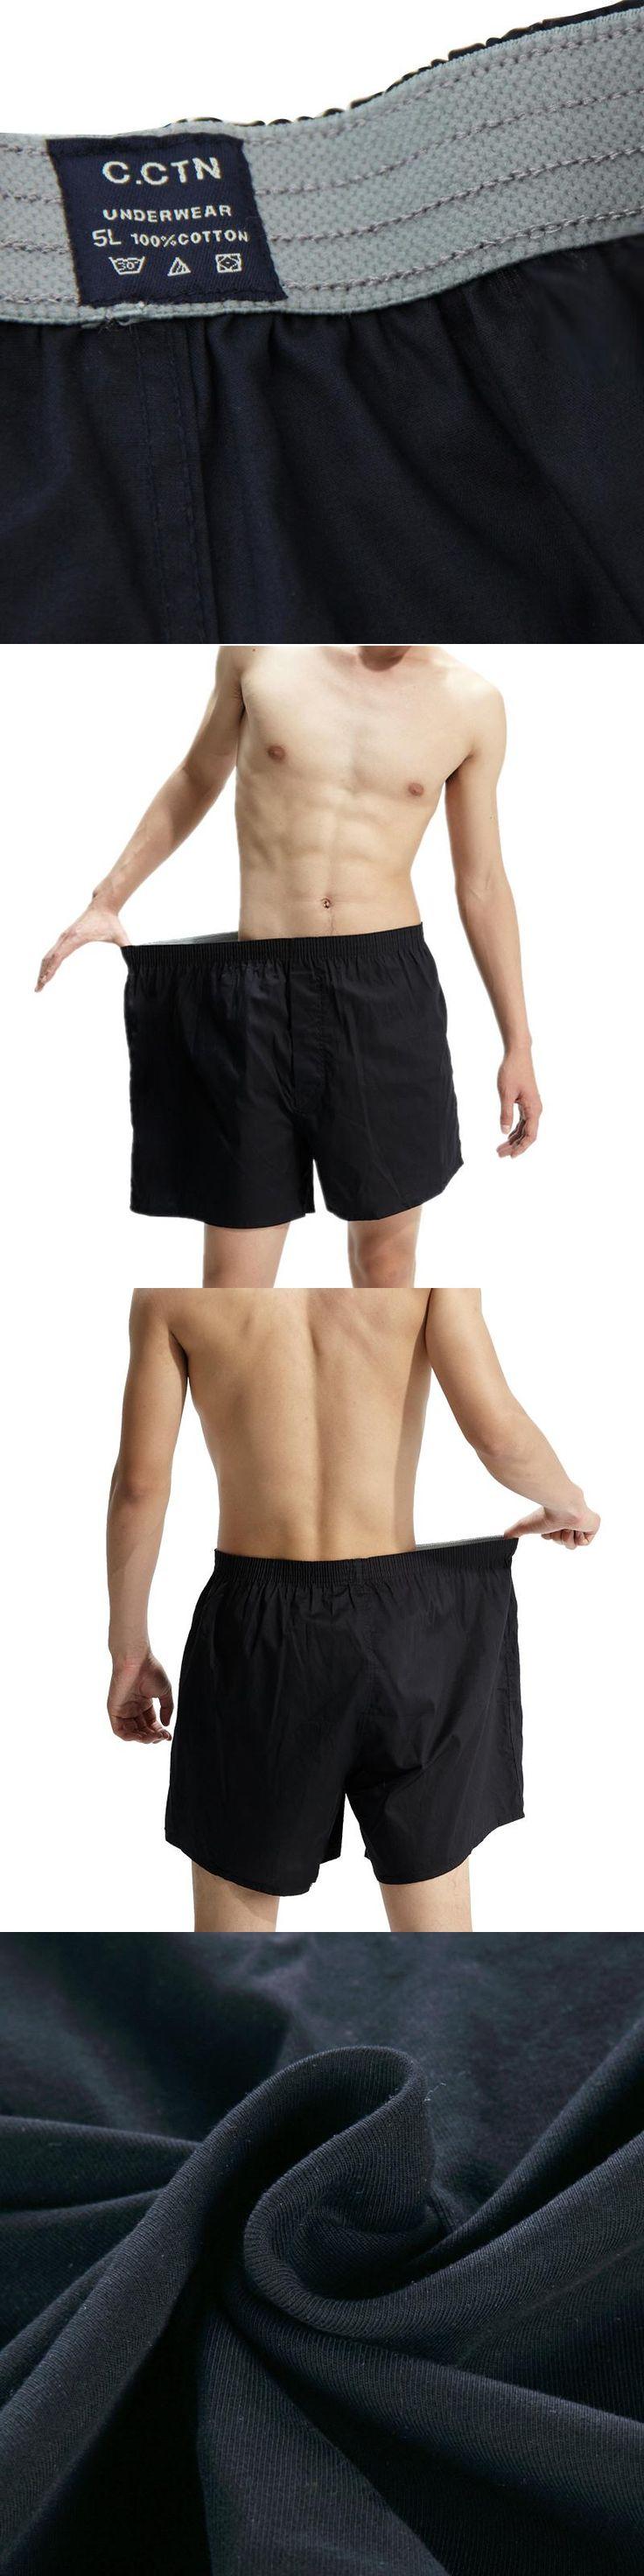 2017 Men Loungewear Men's Sleep Bottoms Bigger Plus Size Cotton Solid Casual Loose Comfortable Male Pajamas Sheer Boxer Pants